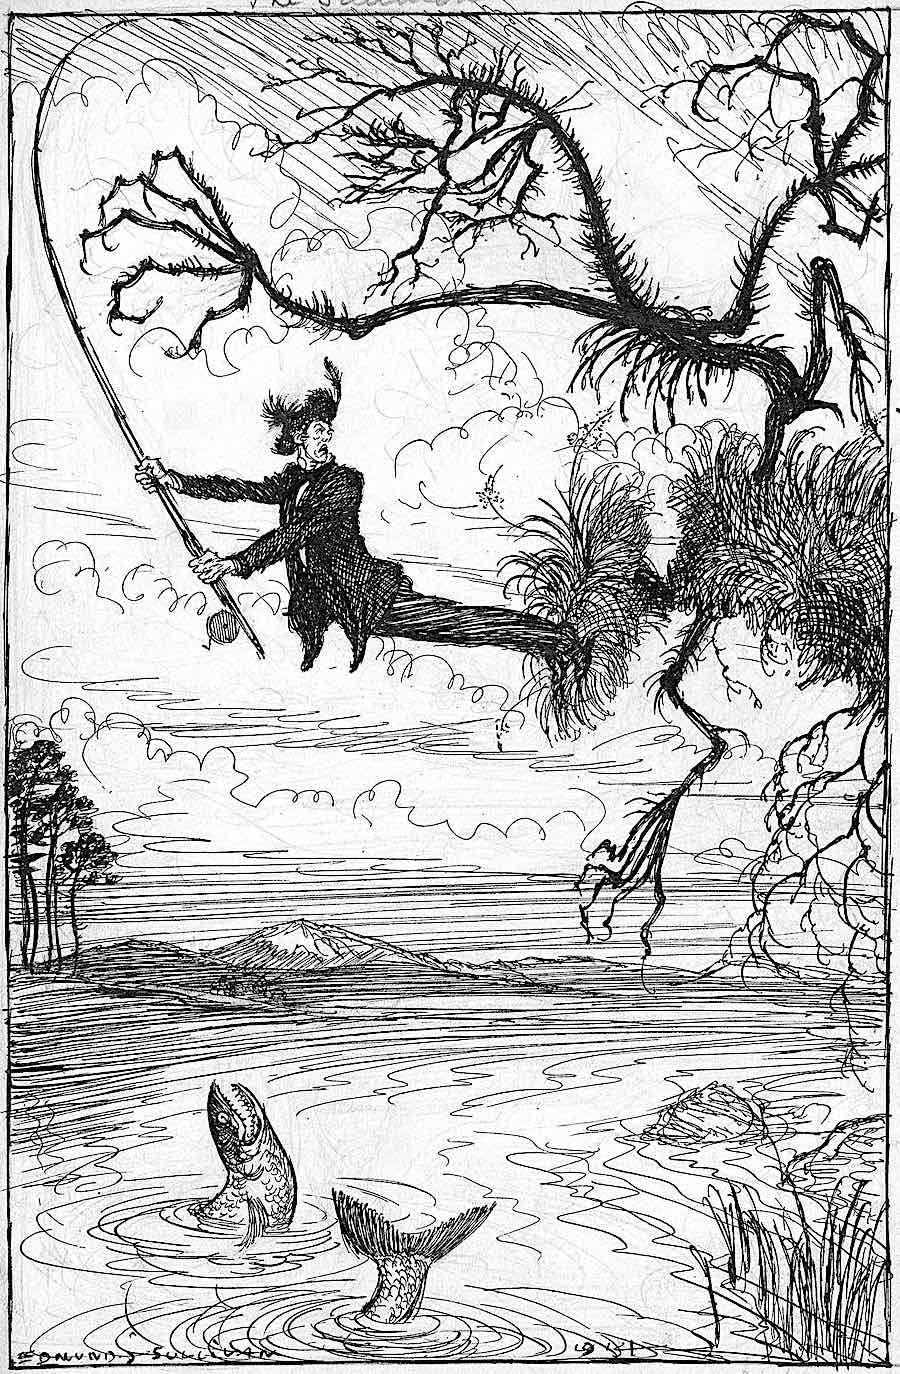 an Edmund Joseph Sullivan drawing of a sport fisher's problems